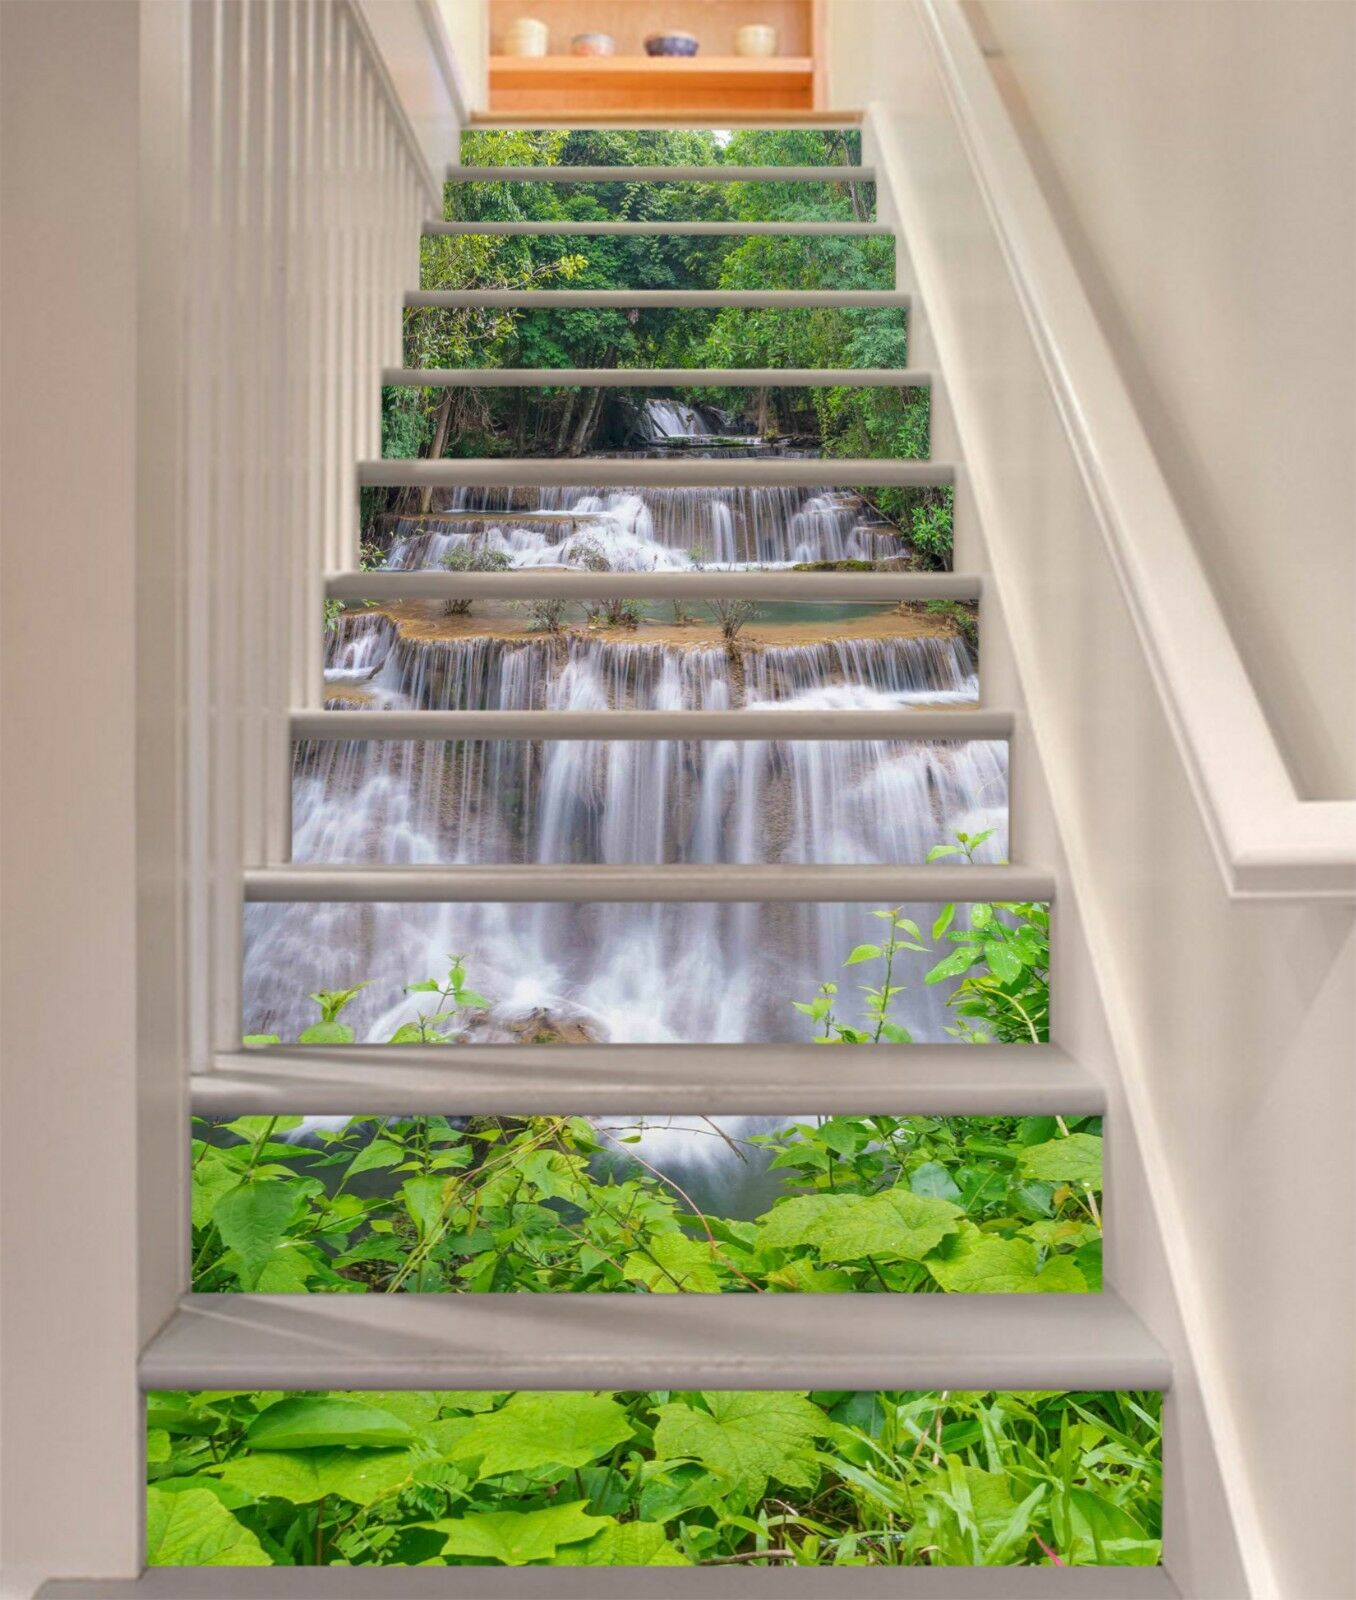 3D Stream 8 Stair Risers Decoration Photo Mural Vinyl Decal WandPapier US